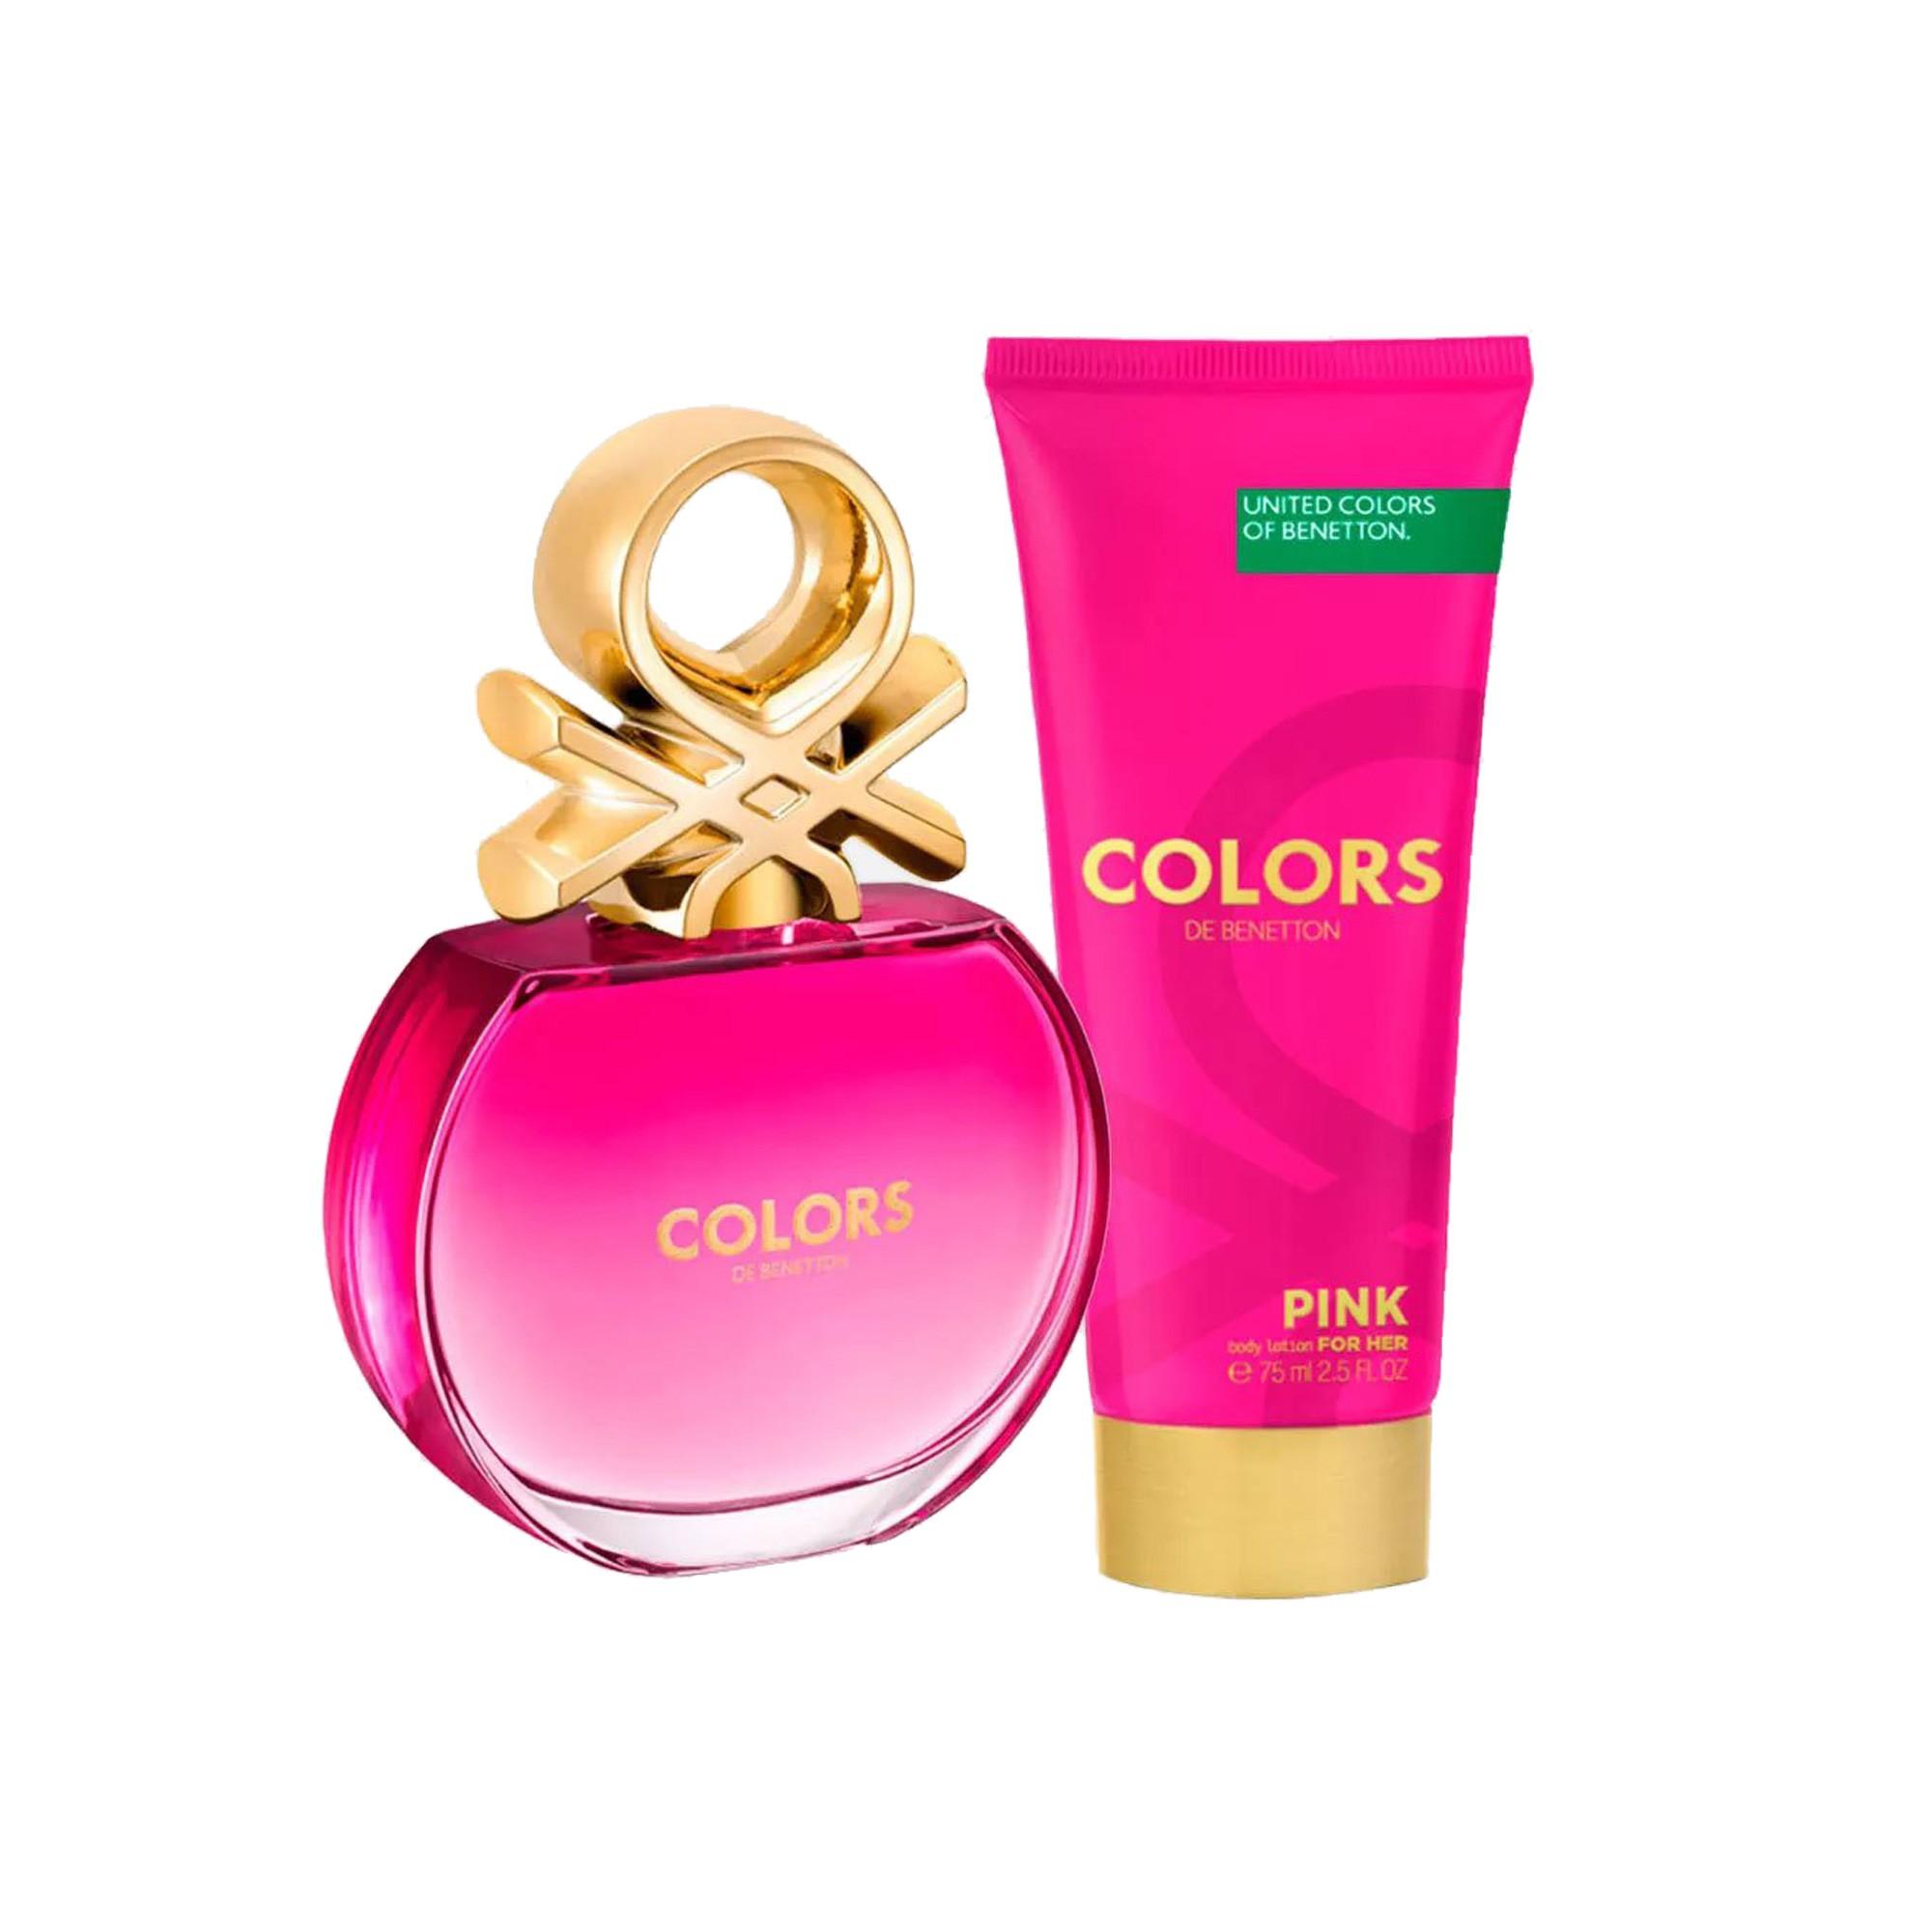 Cofferet Beneton Colors Pink 80 Ml